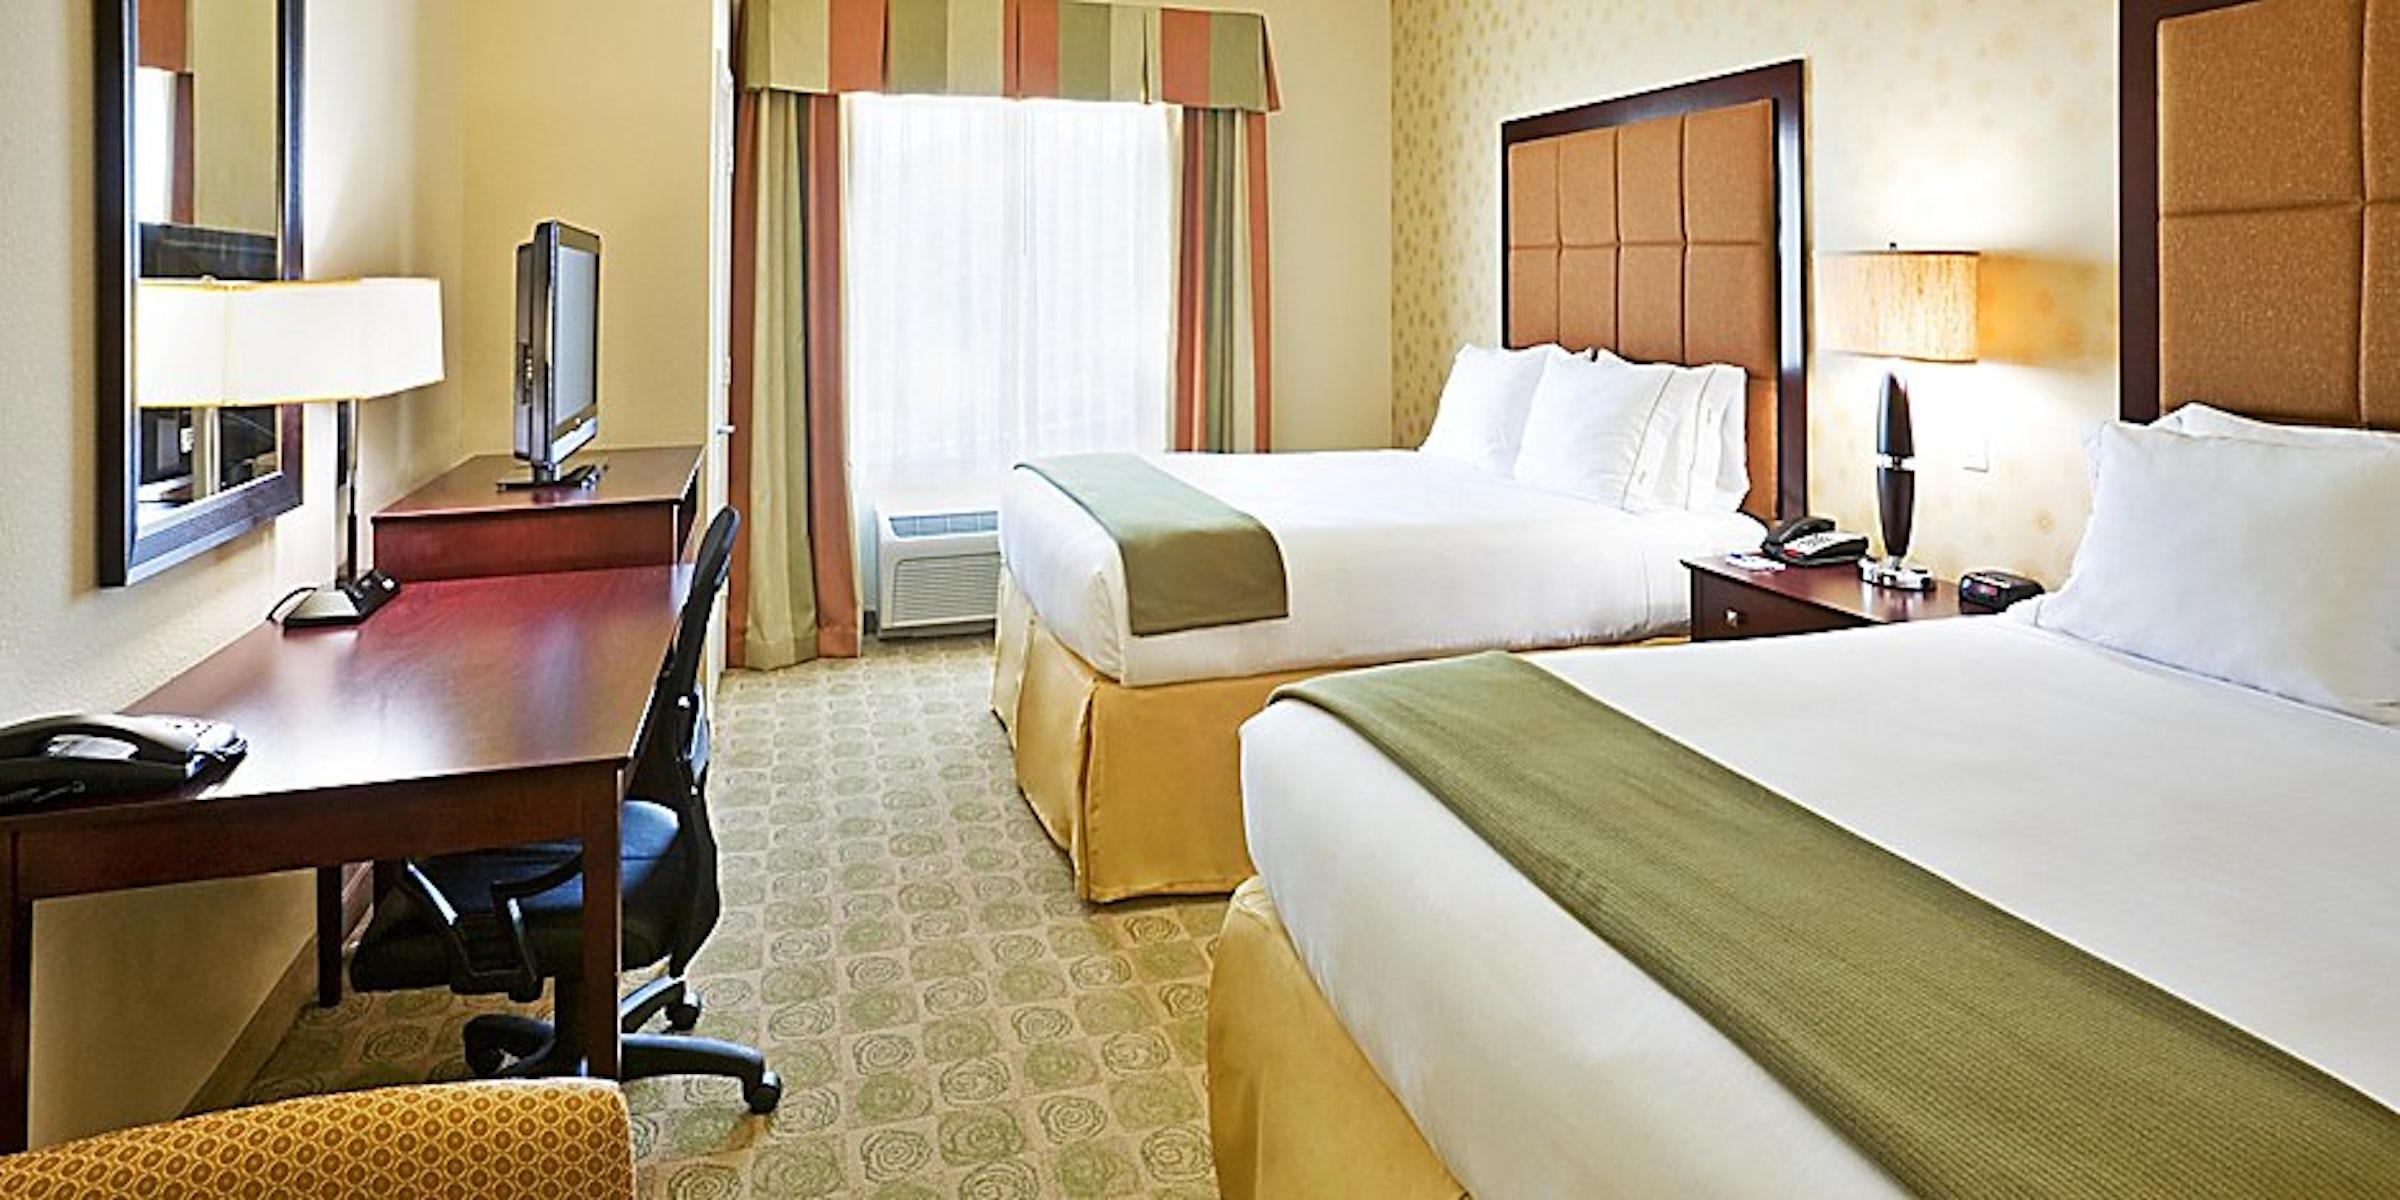 Holiday Inn Express & Suites Dallas East Fair Park in Beyond Dallas